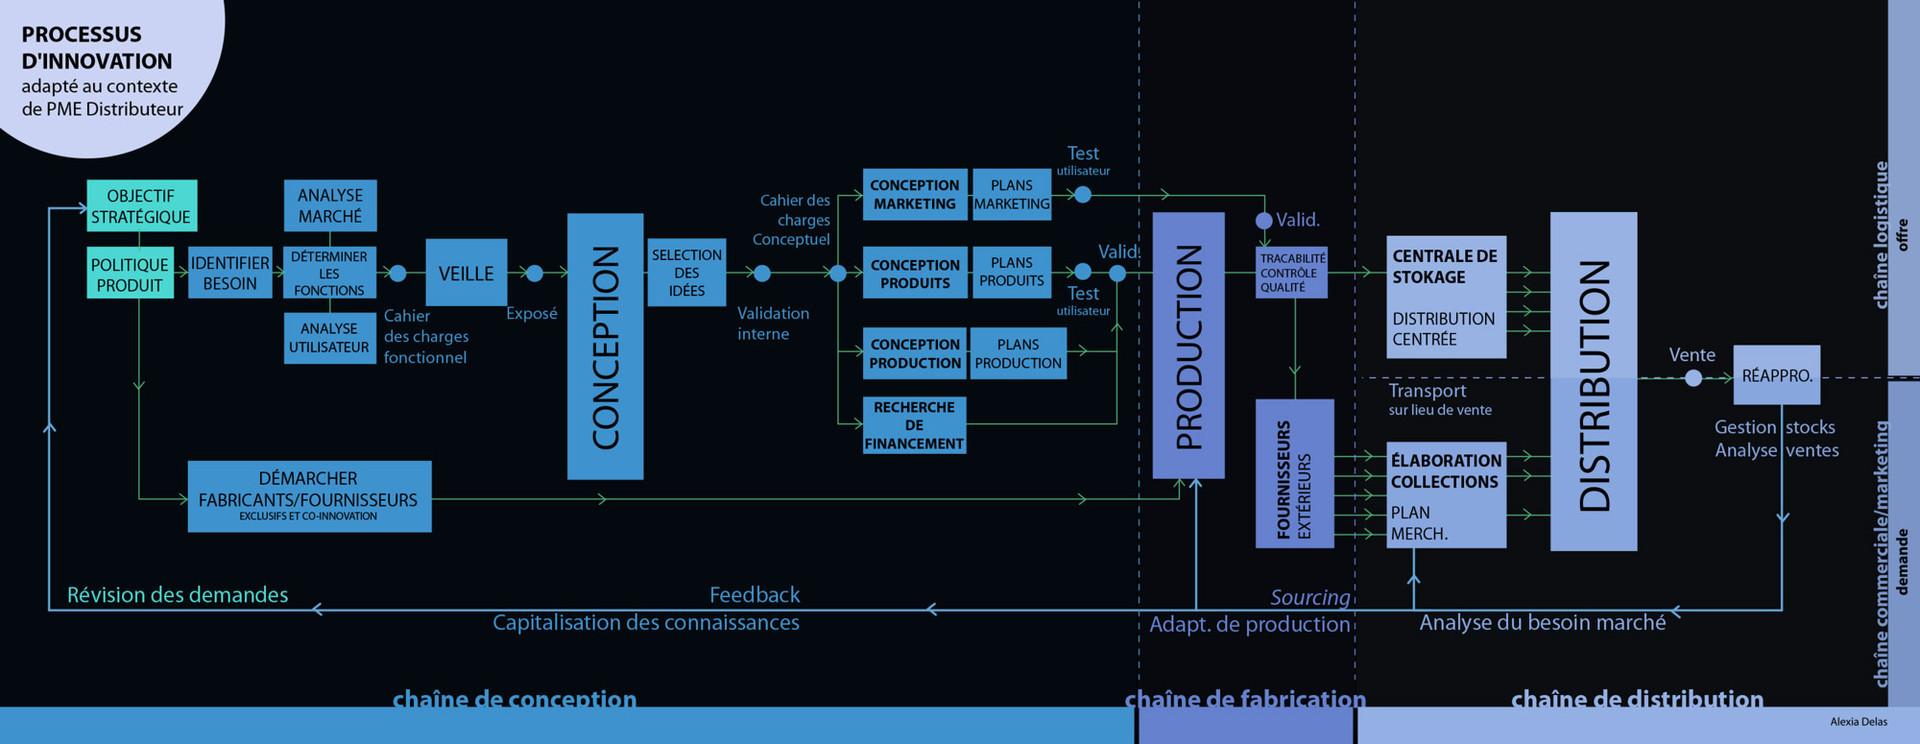 Design Process & recherche en innovation I PME